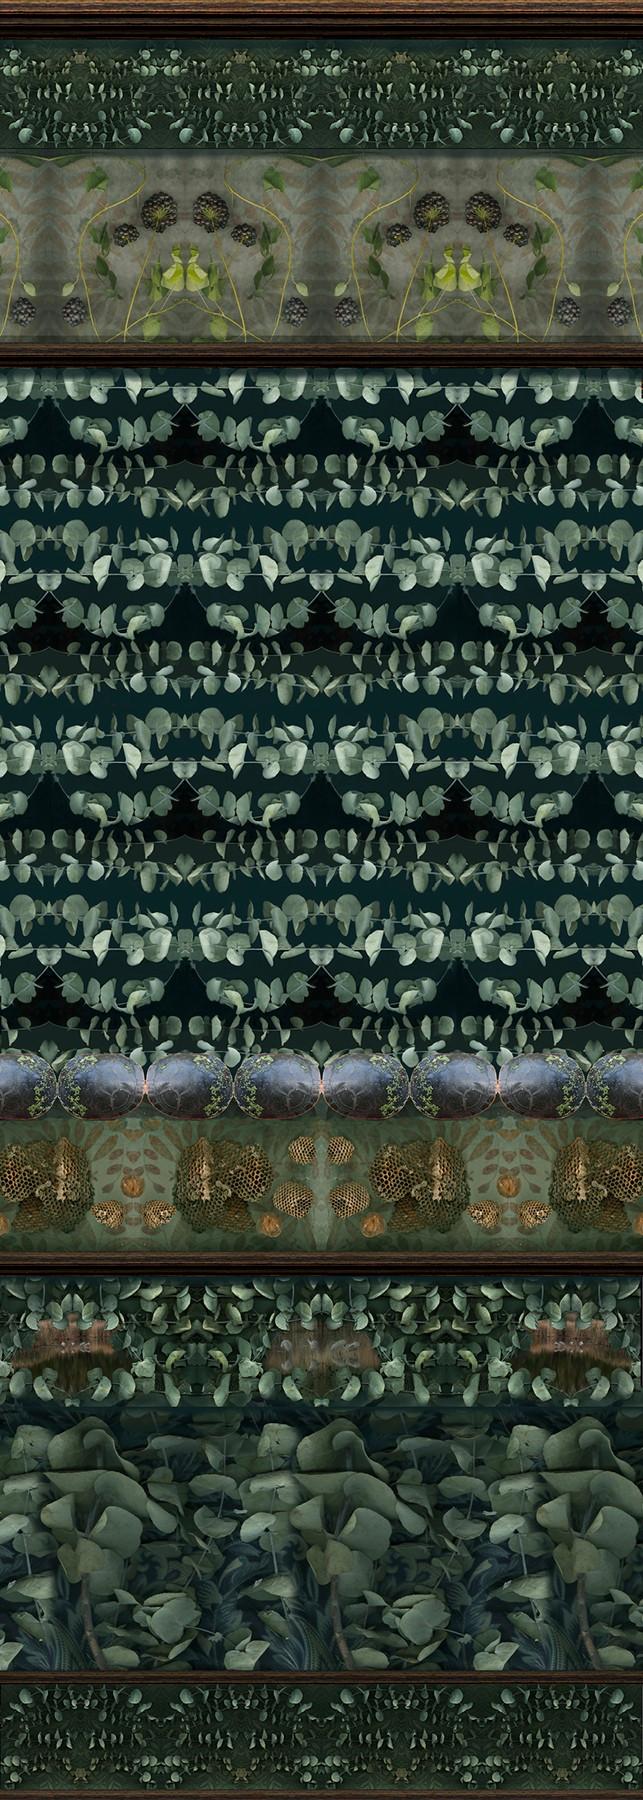 frank_specimen_panel_with_eucalyptus_turtle_shells_and_honeycomb_54_x_1925.jpg